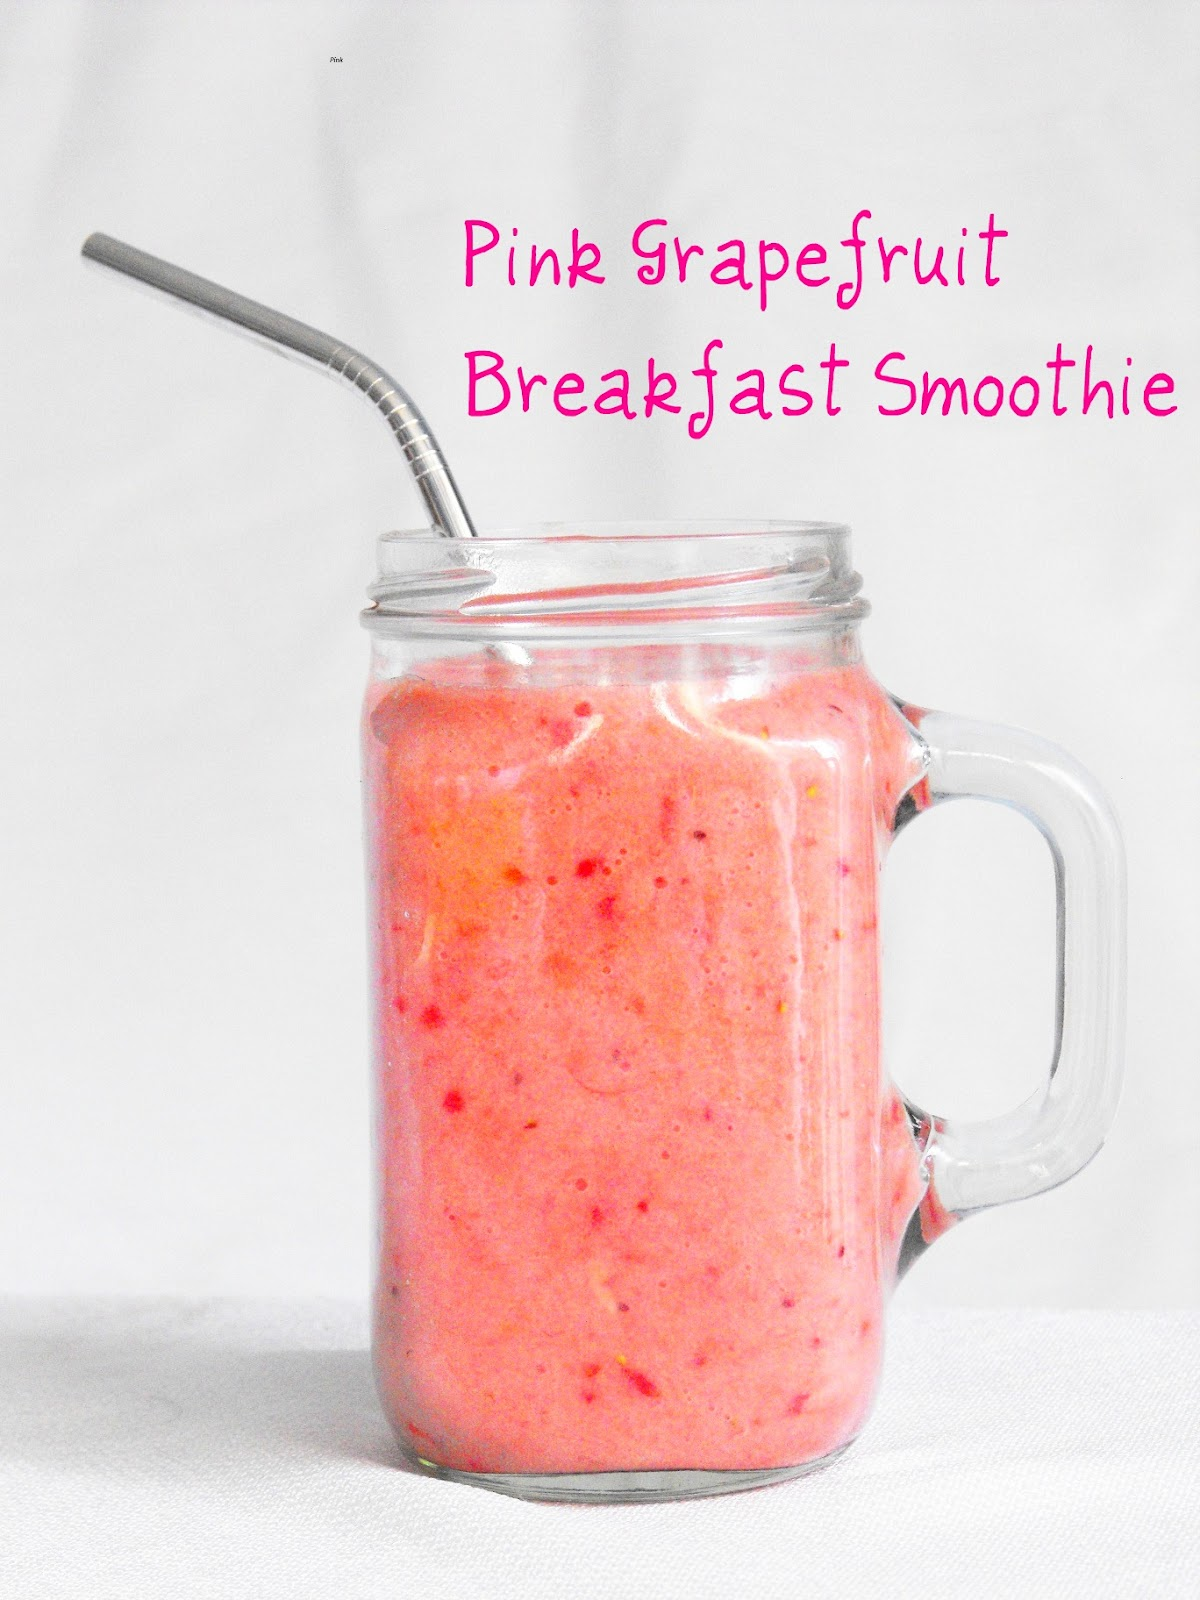 Pink Grapefruit Smoothie Sweet And Tart Breakfast Smoothie